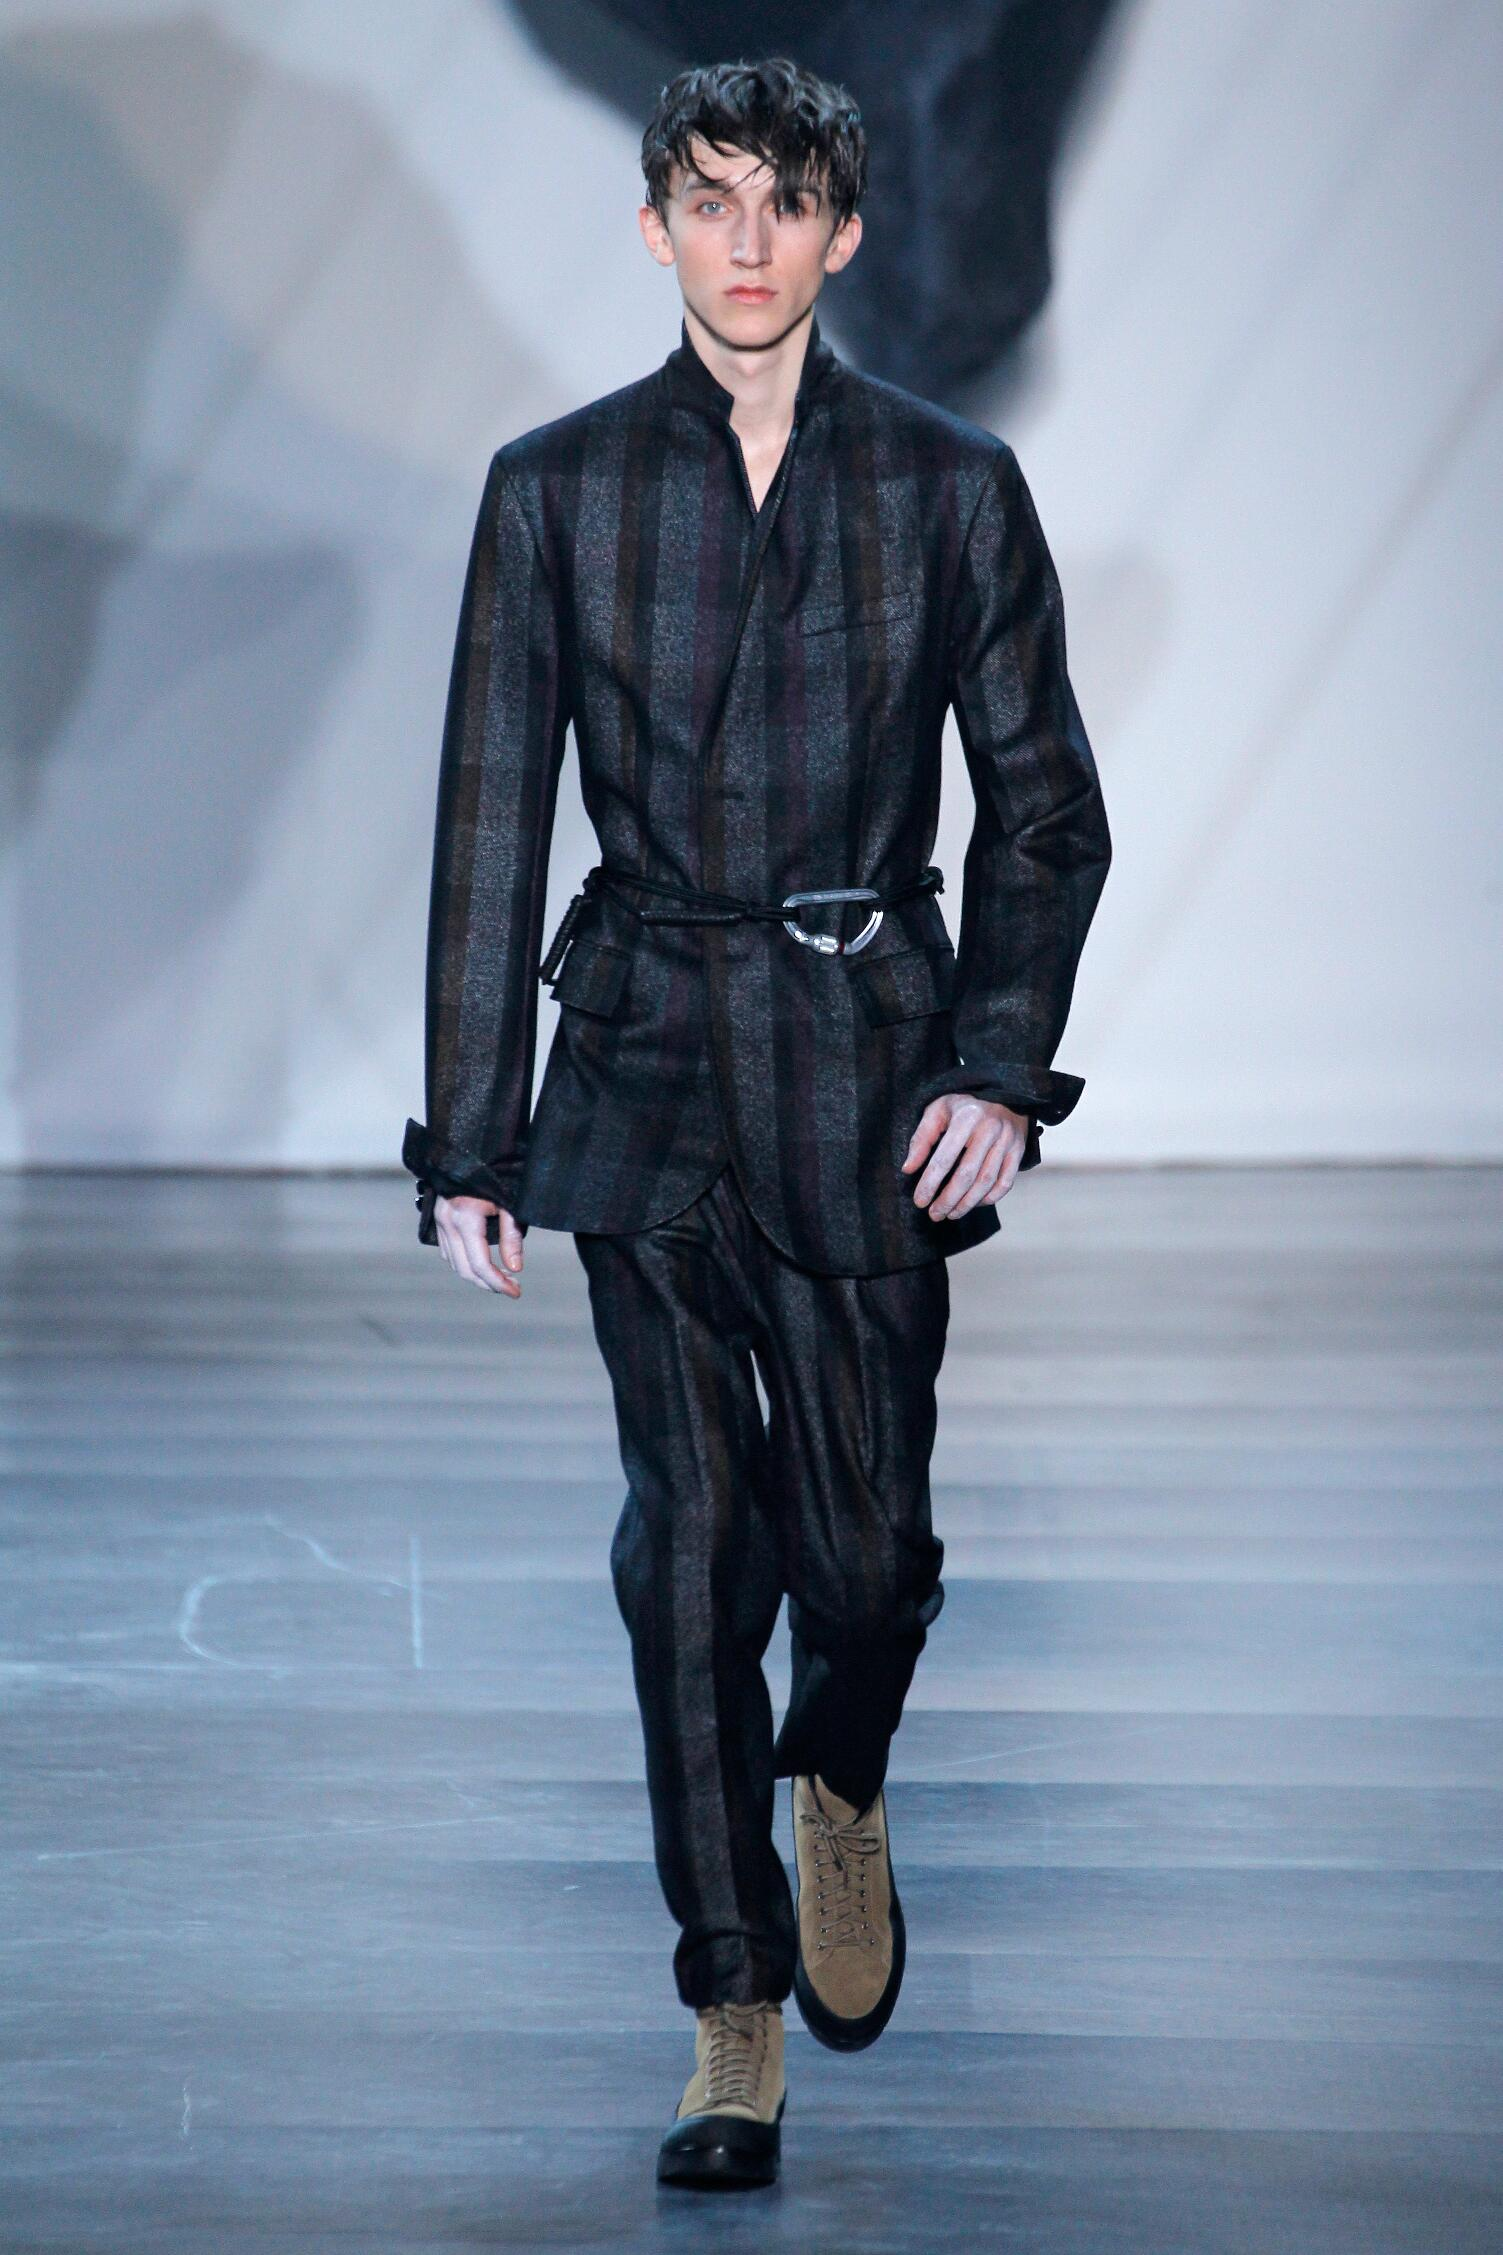 Runway 3.1 Phillip Lim Fall Winter 2015 16 Men's Collection Paris Fashion Week